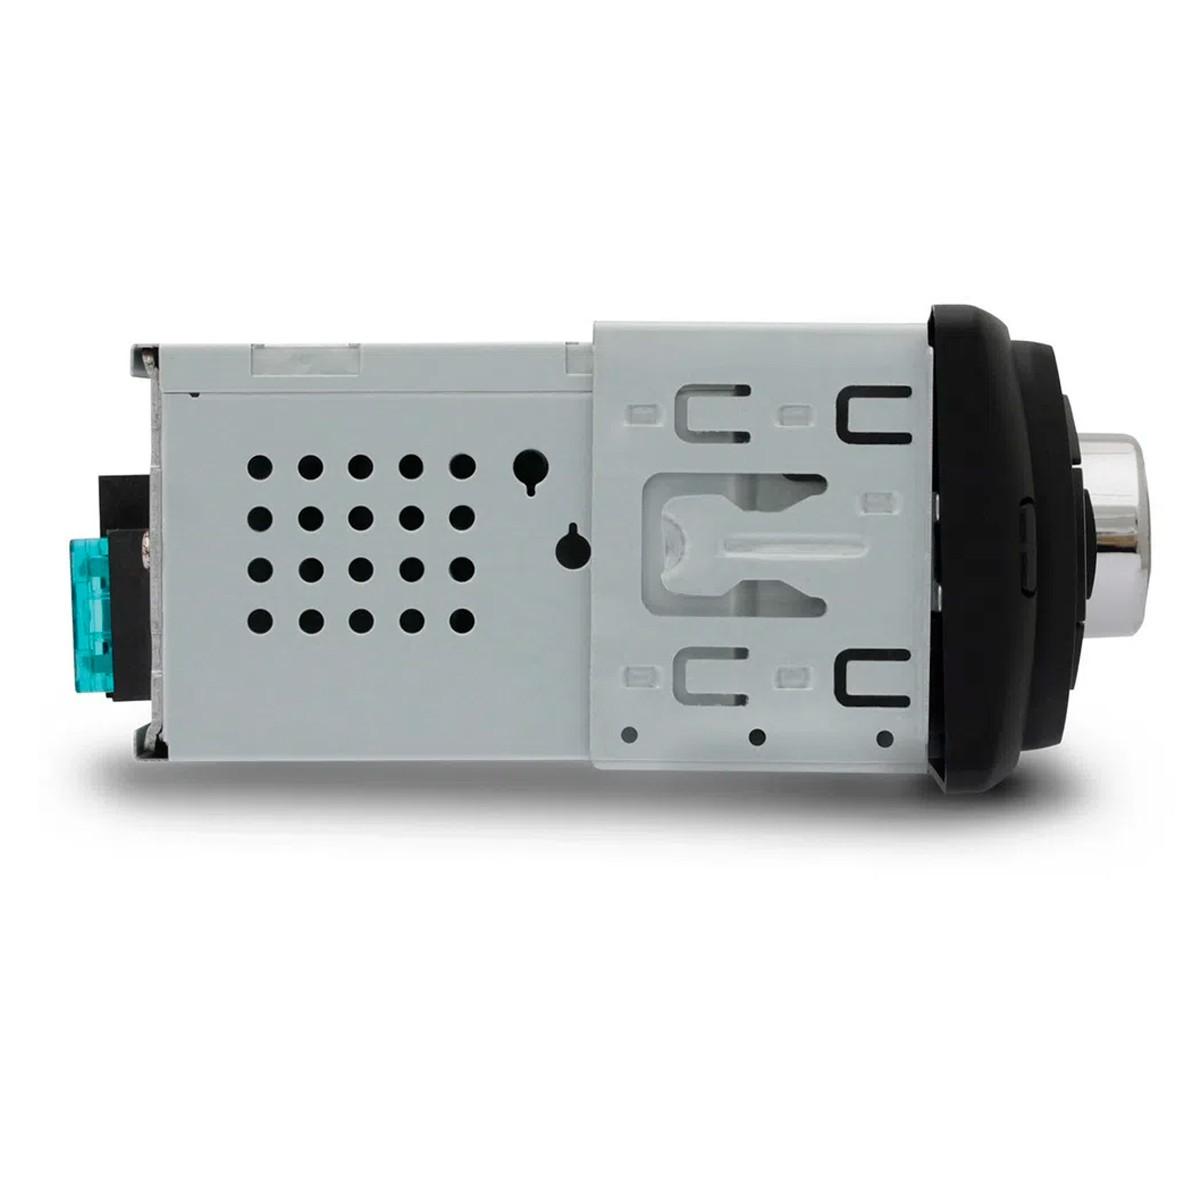 Rádio Automotivo Multilaser New One Mp3 Player 1 Din Led Usb Sd Aux Fm + Pen Drive 8gb